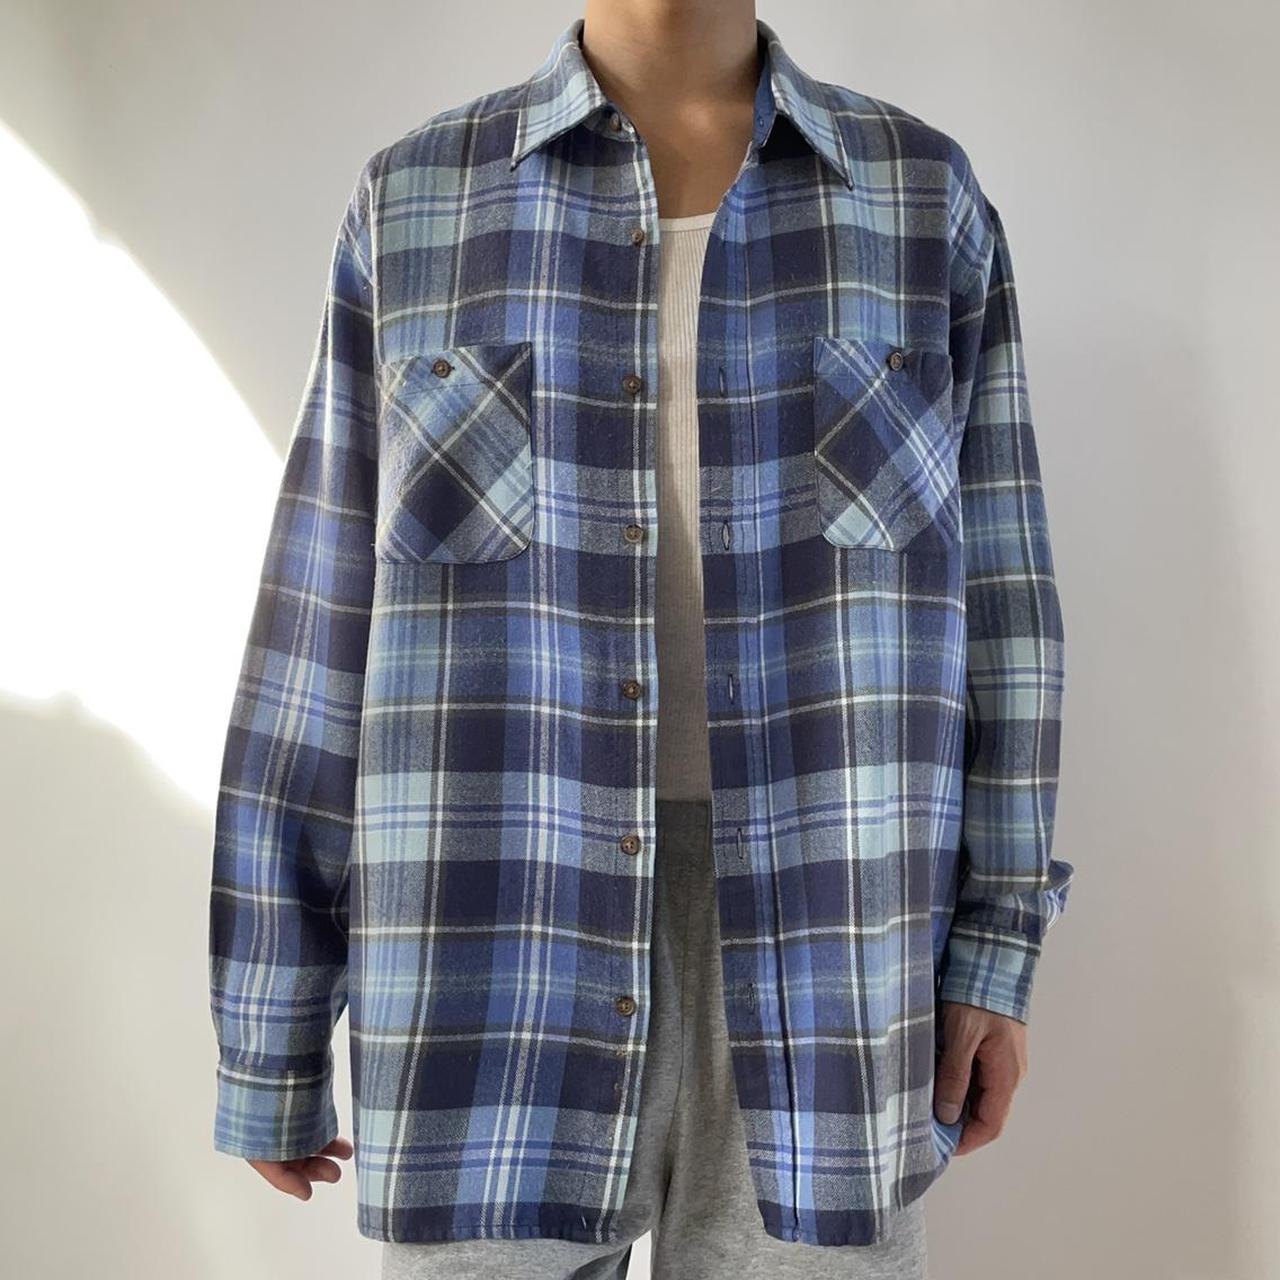 Product Image 1 - Vintage Oversized Flannel  🎸 90s oversized